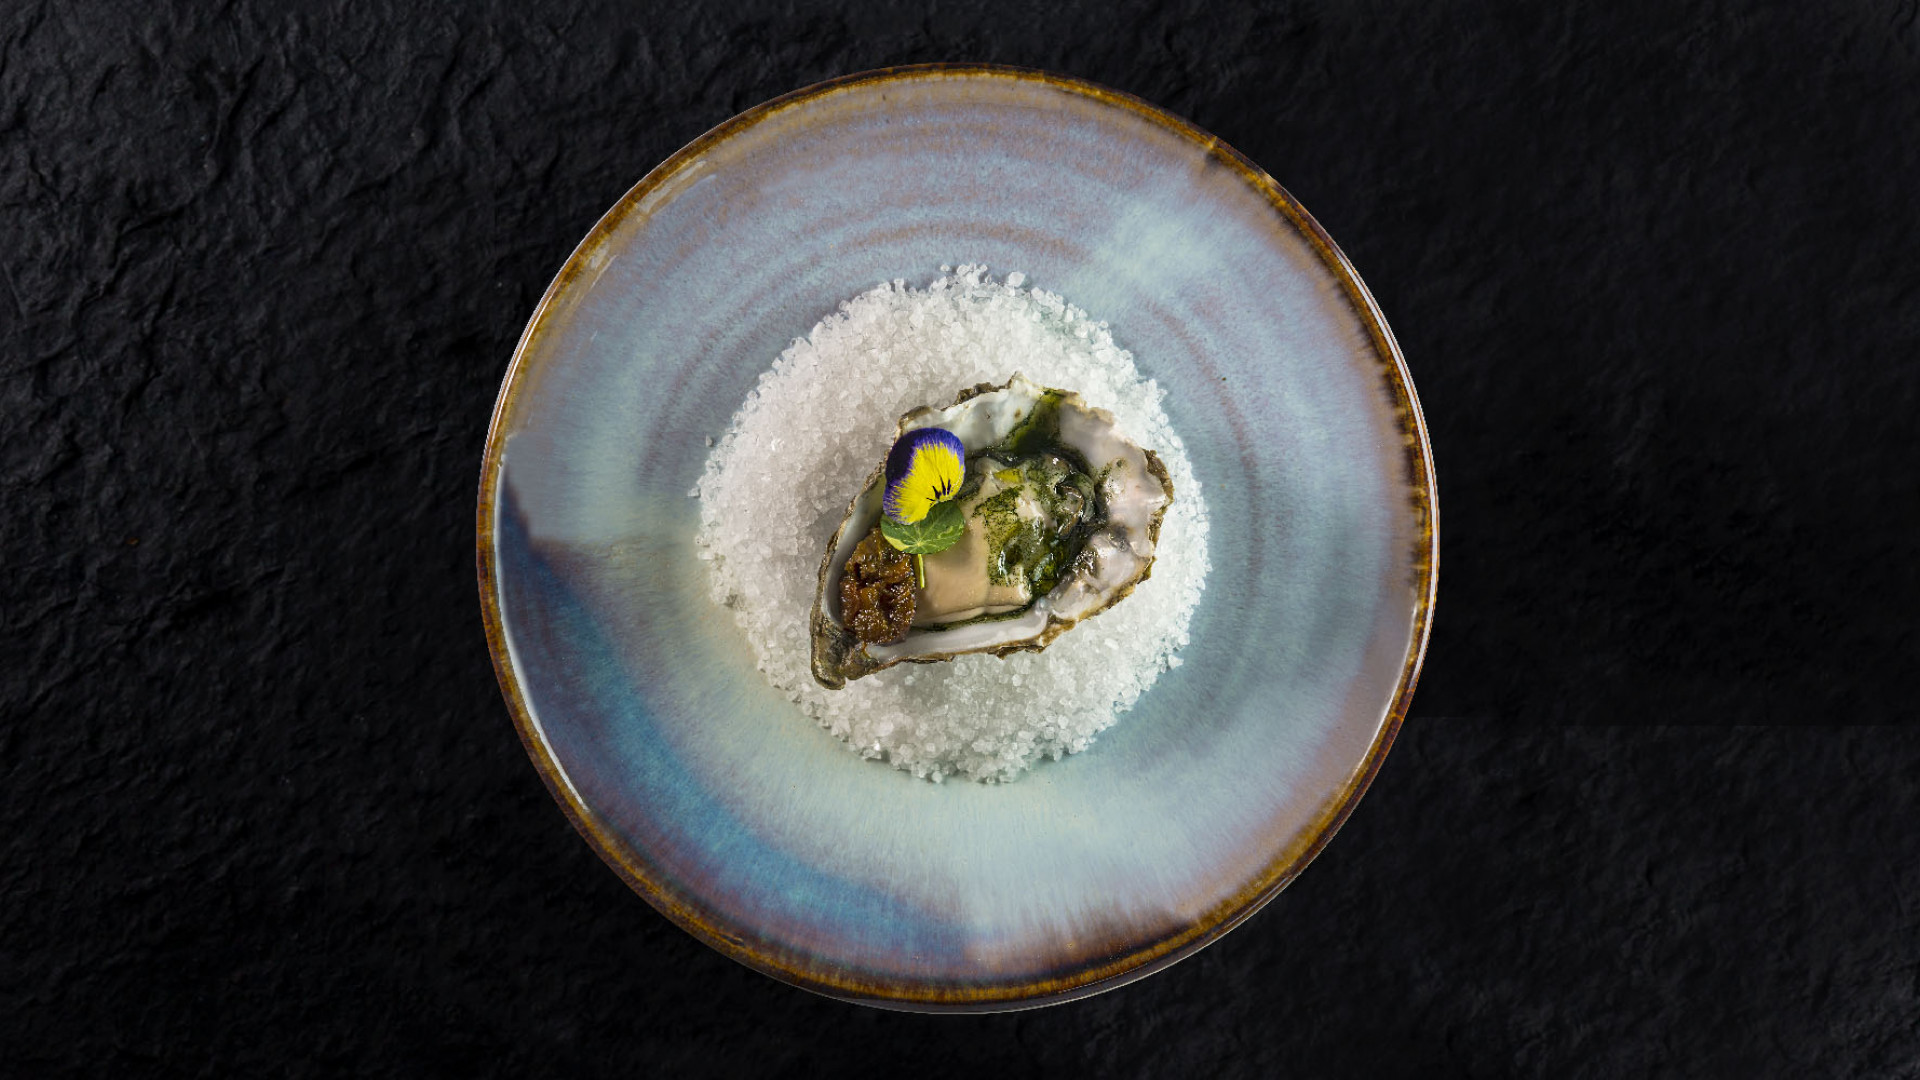 Oyster dish from Rigo